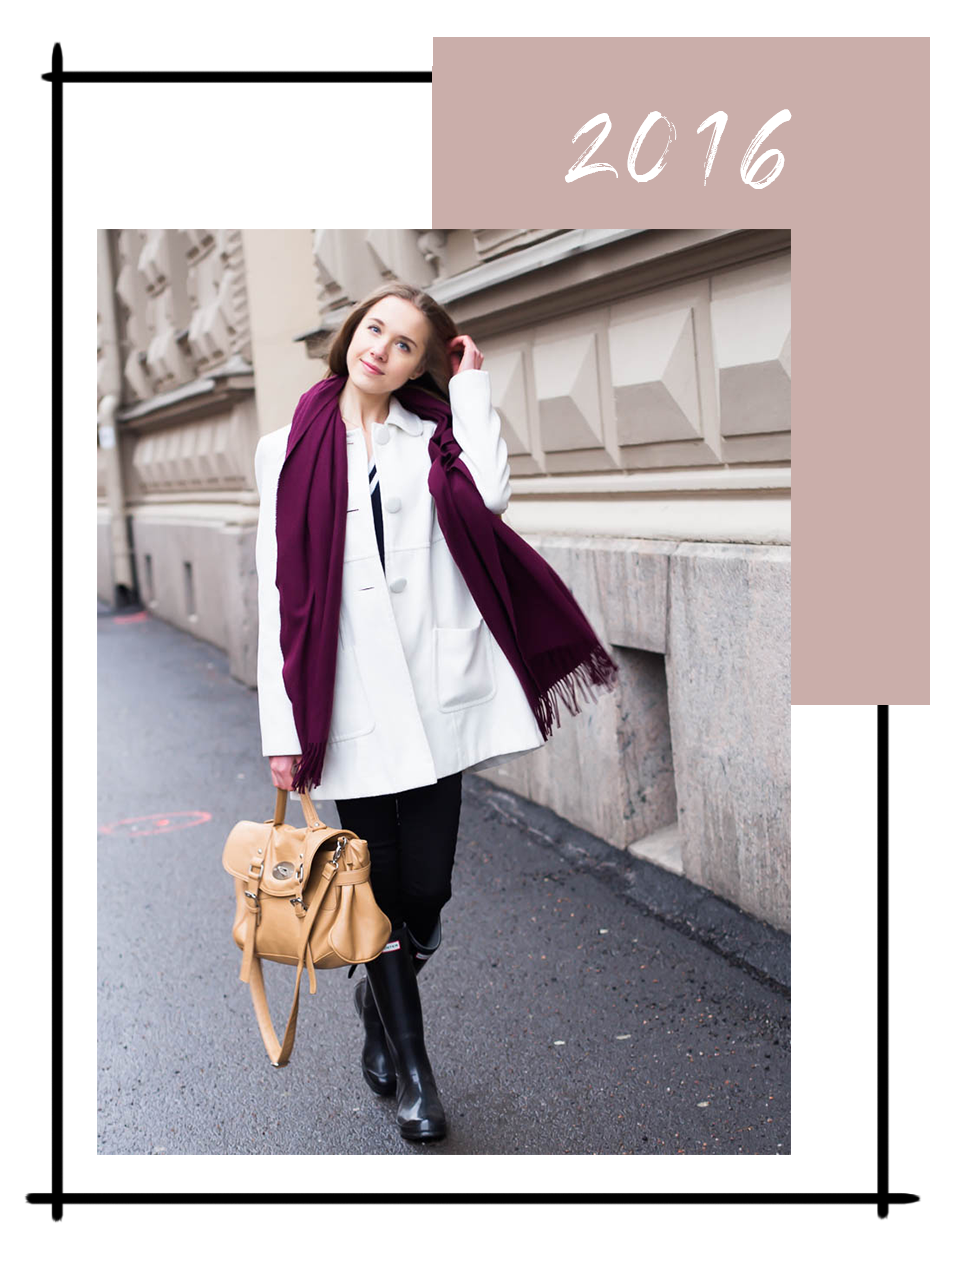 Fashion blogger outfit archives, preppy style - Muoti, bloggaaja, asukuvien arkistot, preppy-tyyli